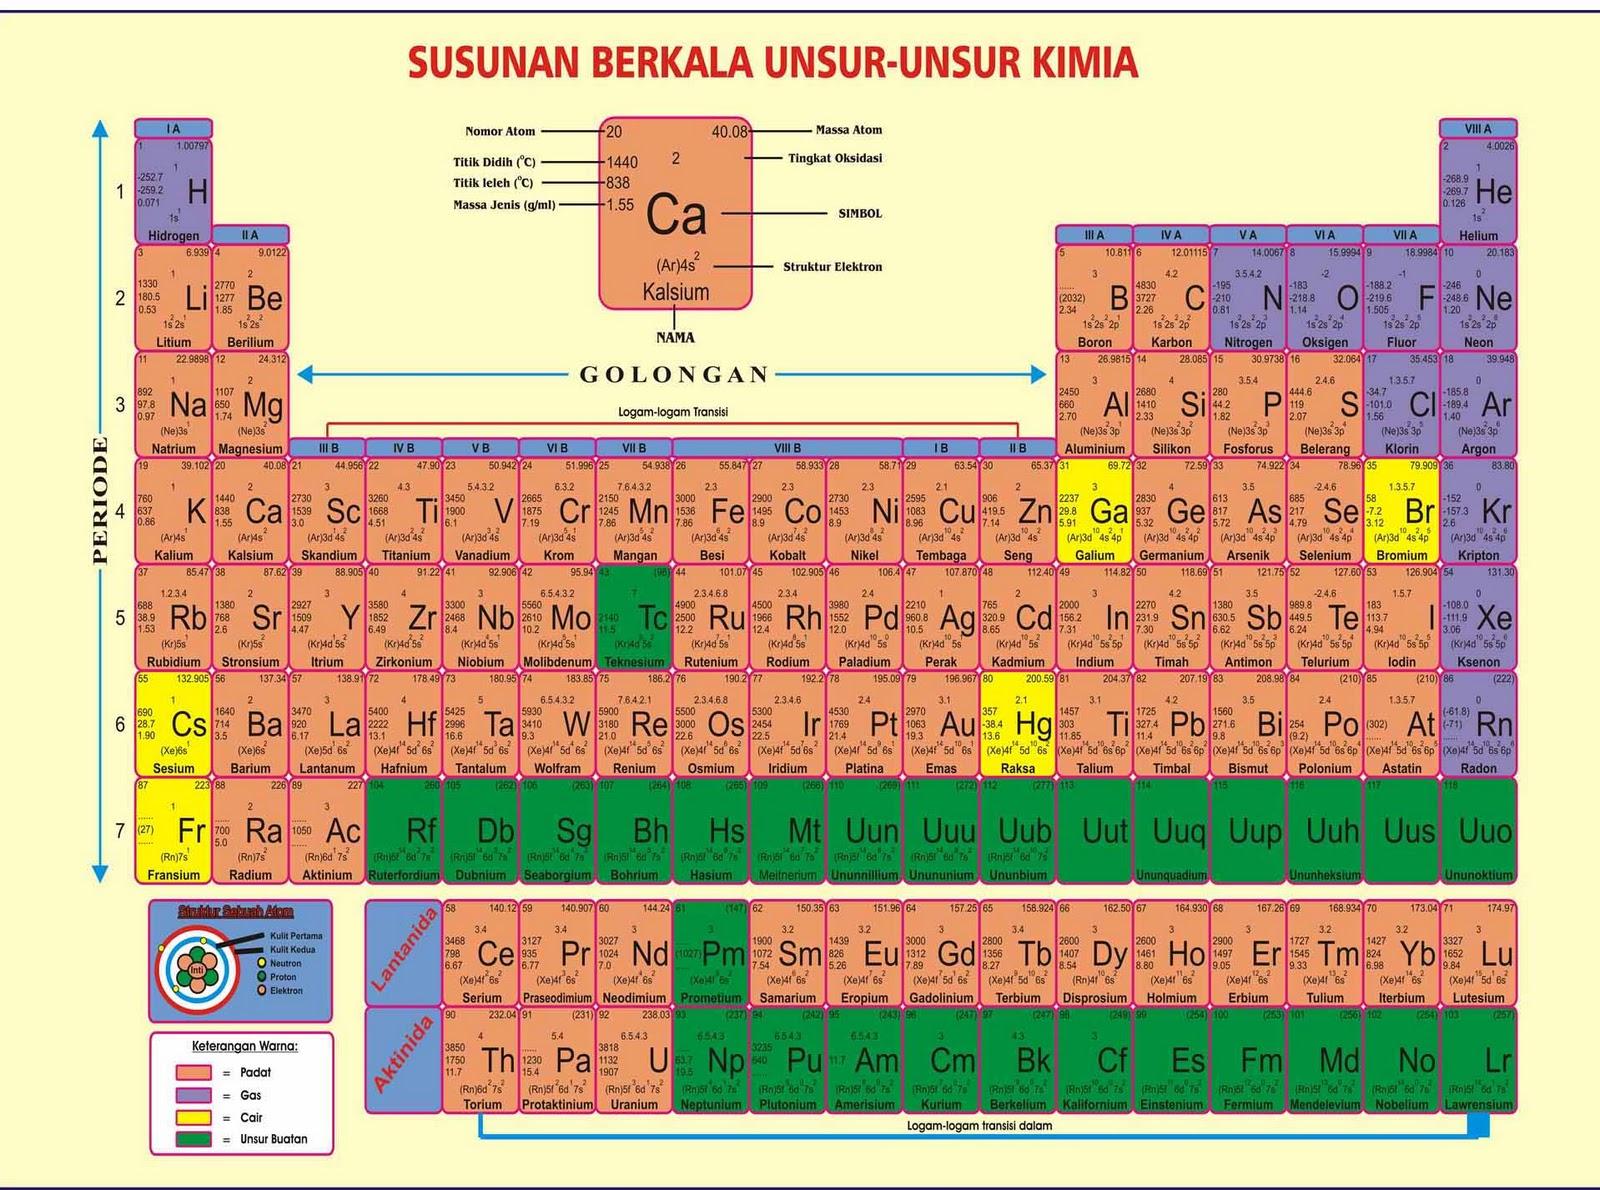 DHIMAM PRAHARA KHAN BLOG: Sistem Periodik (Susunan Berkala Unsur2 ...